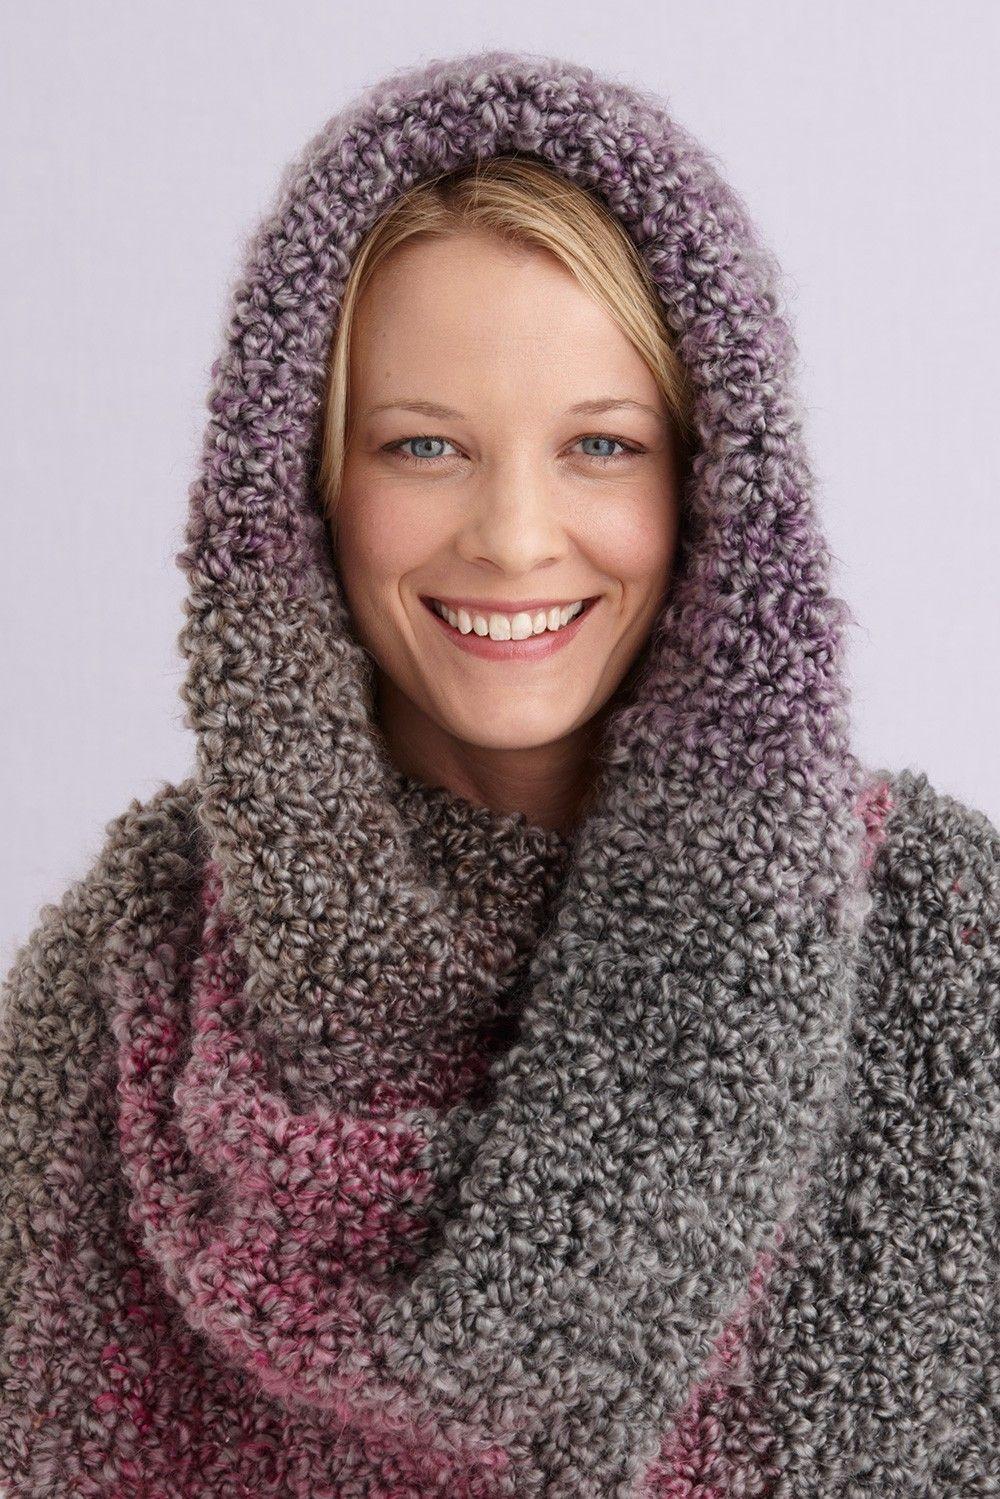 Lush Hooded Scarf (Crochet) - Lion Brand Yarn | crochet | Pinterest ...